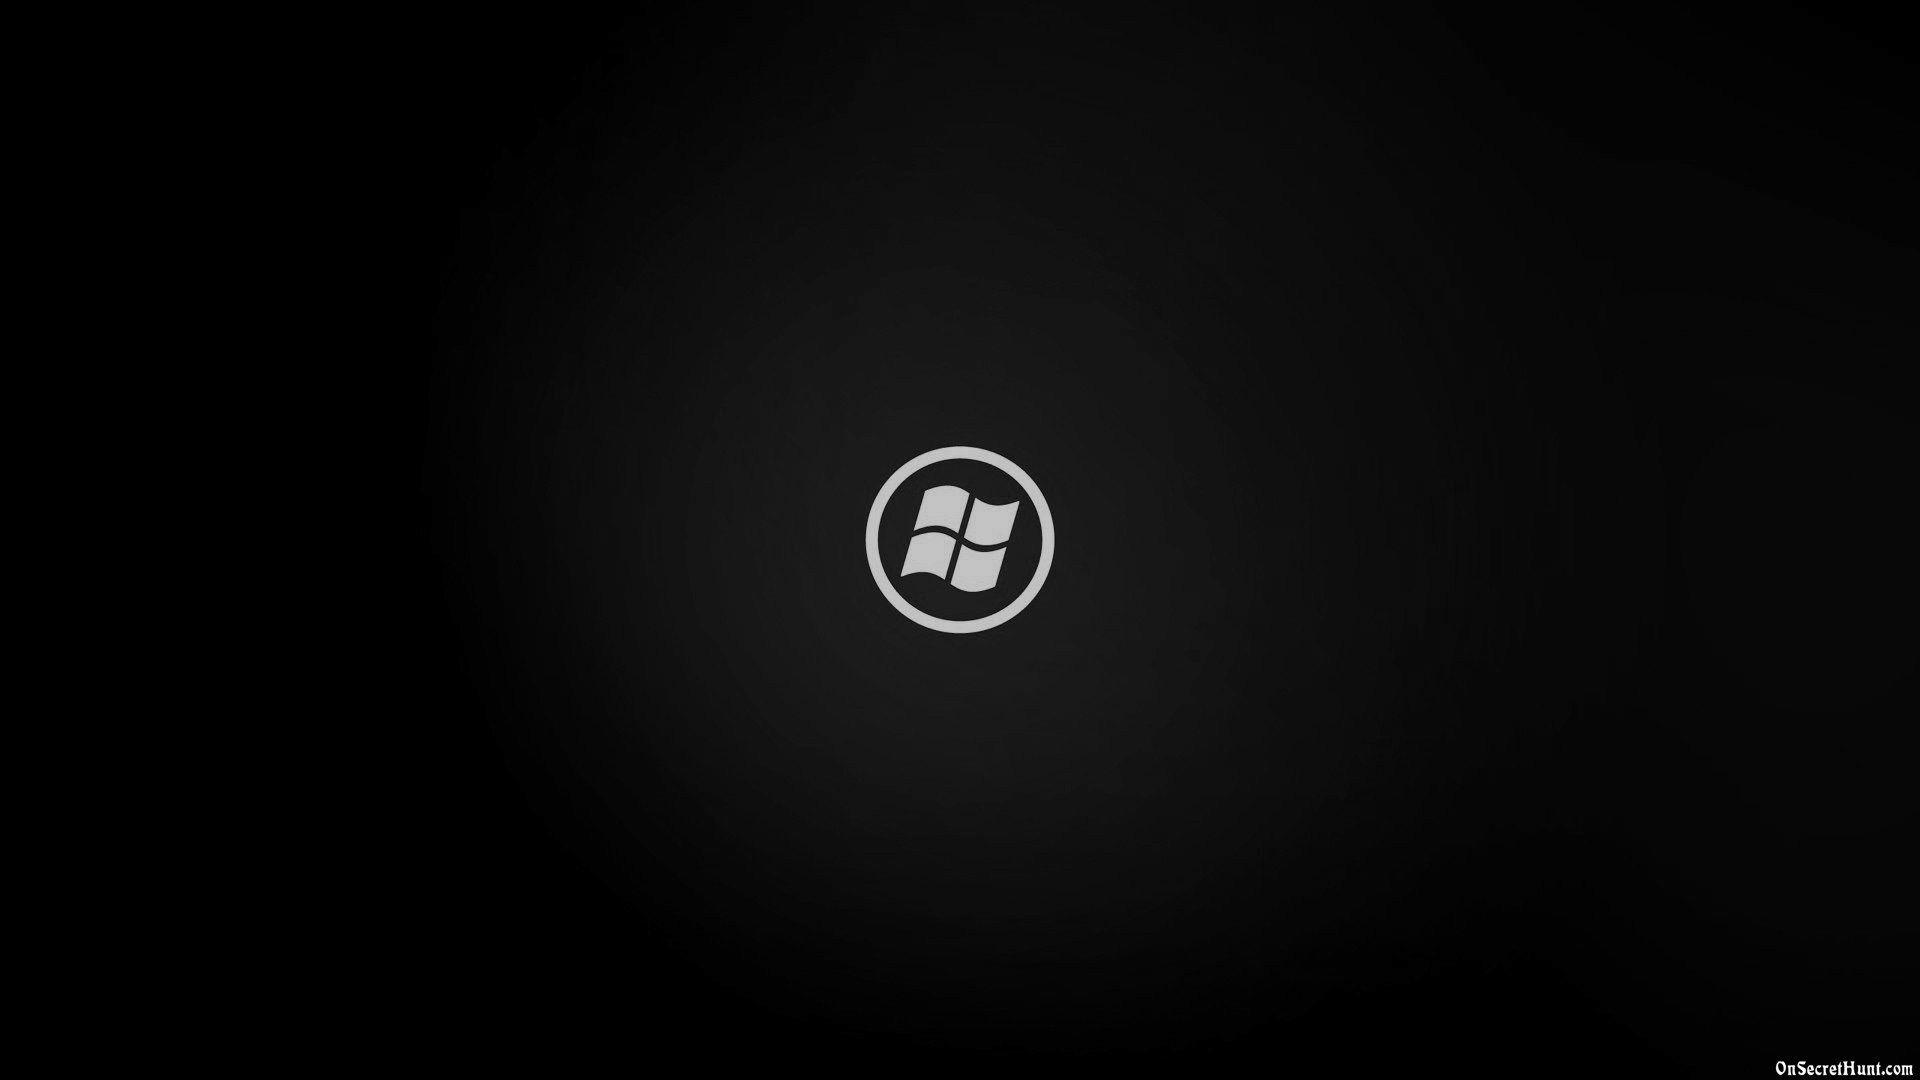 Black Wallpaper of Windows background – BACKGROUND WALLPAPER .